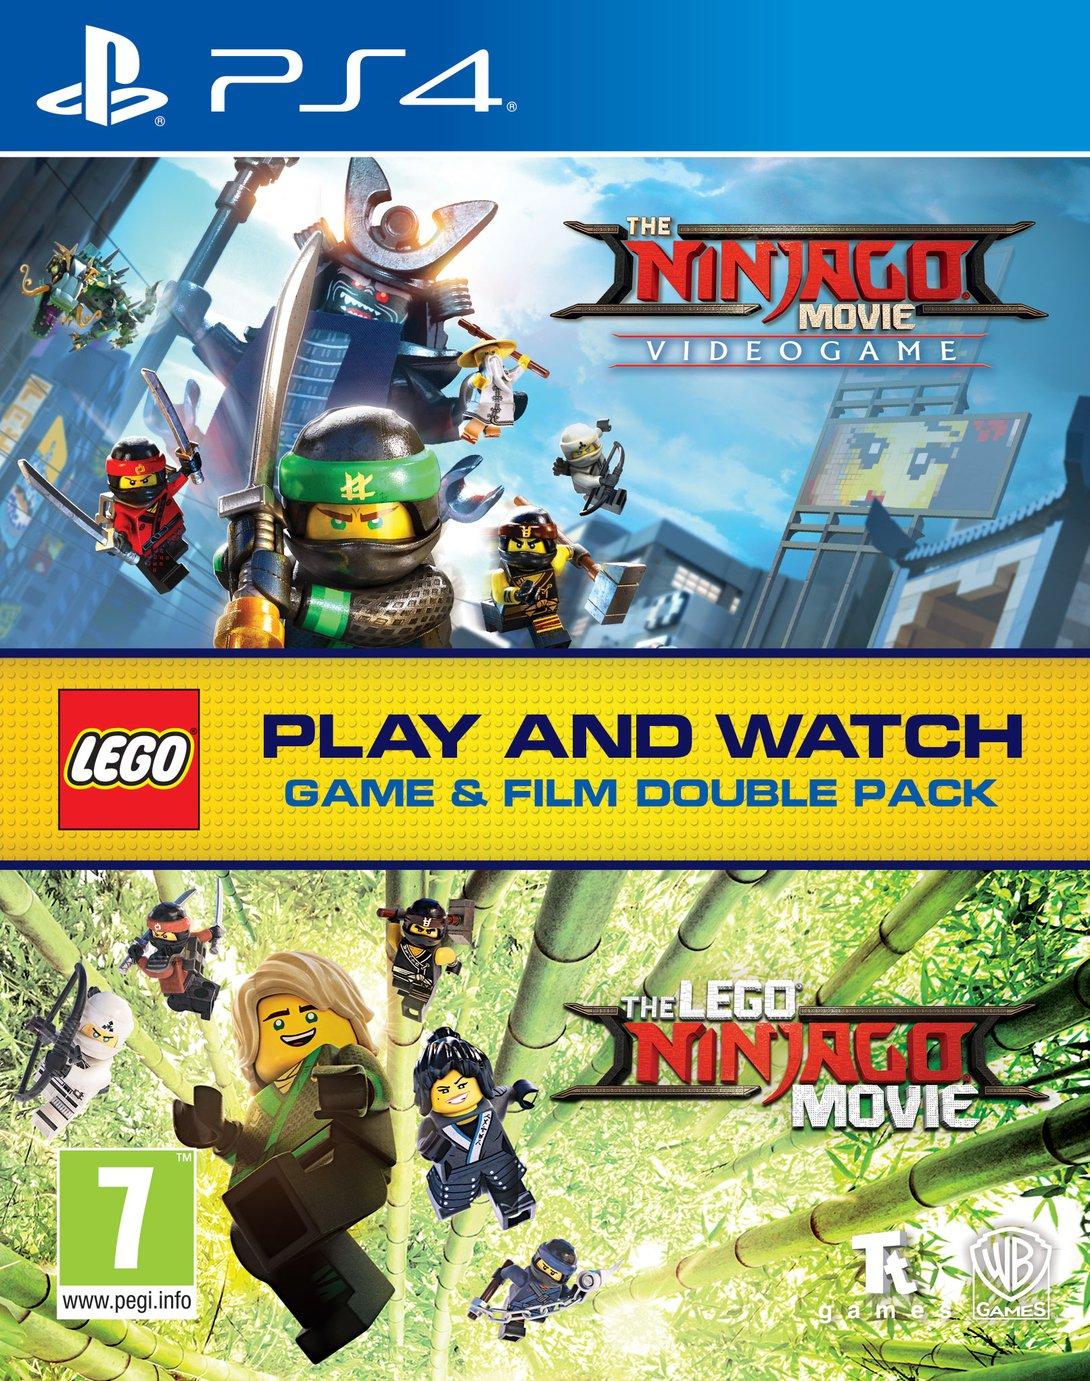 LEGO Ninjago Double Pack PS4 Game & Movie Bundle - £9.99 @ Argos